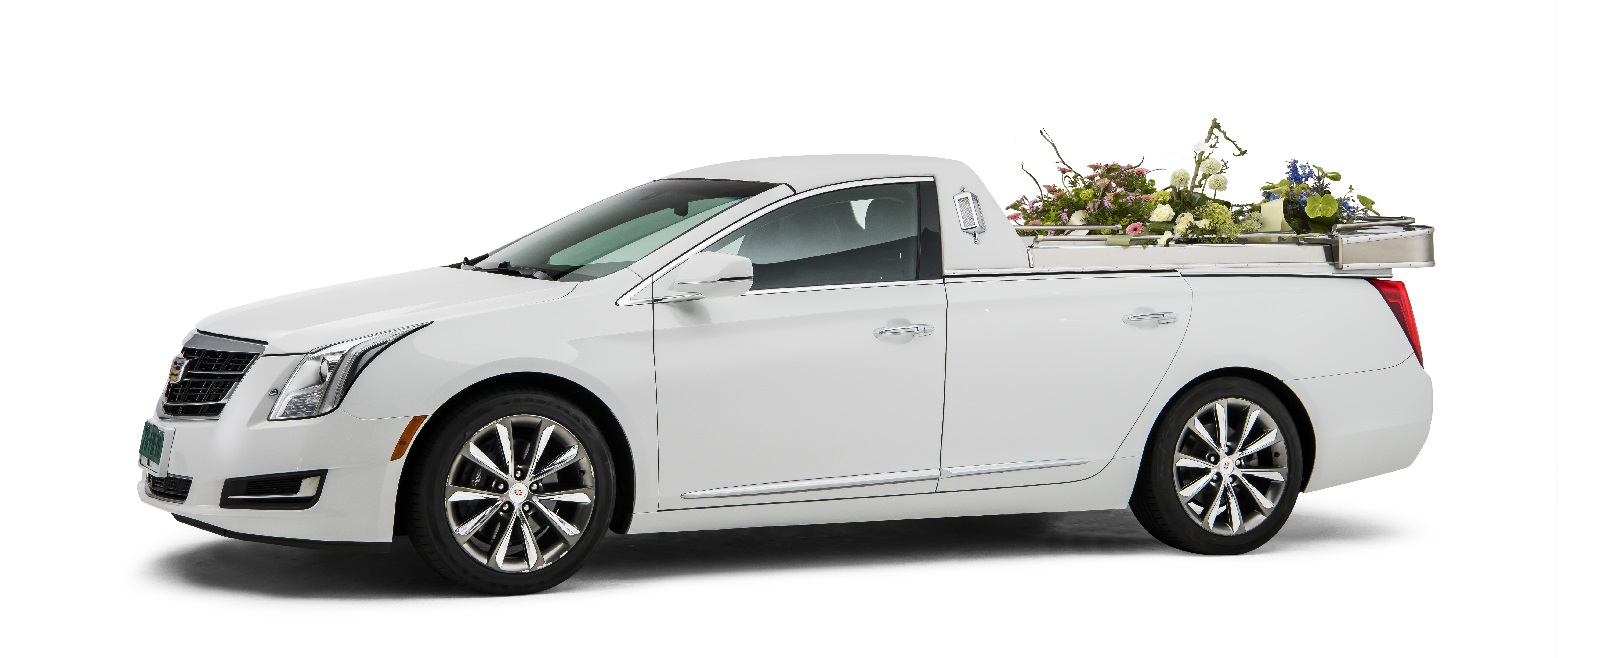 Caddilac-wit-open-bloemenauto-2020 Charon Uitvaart SV